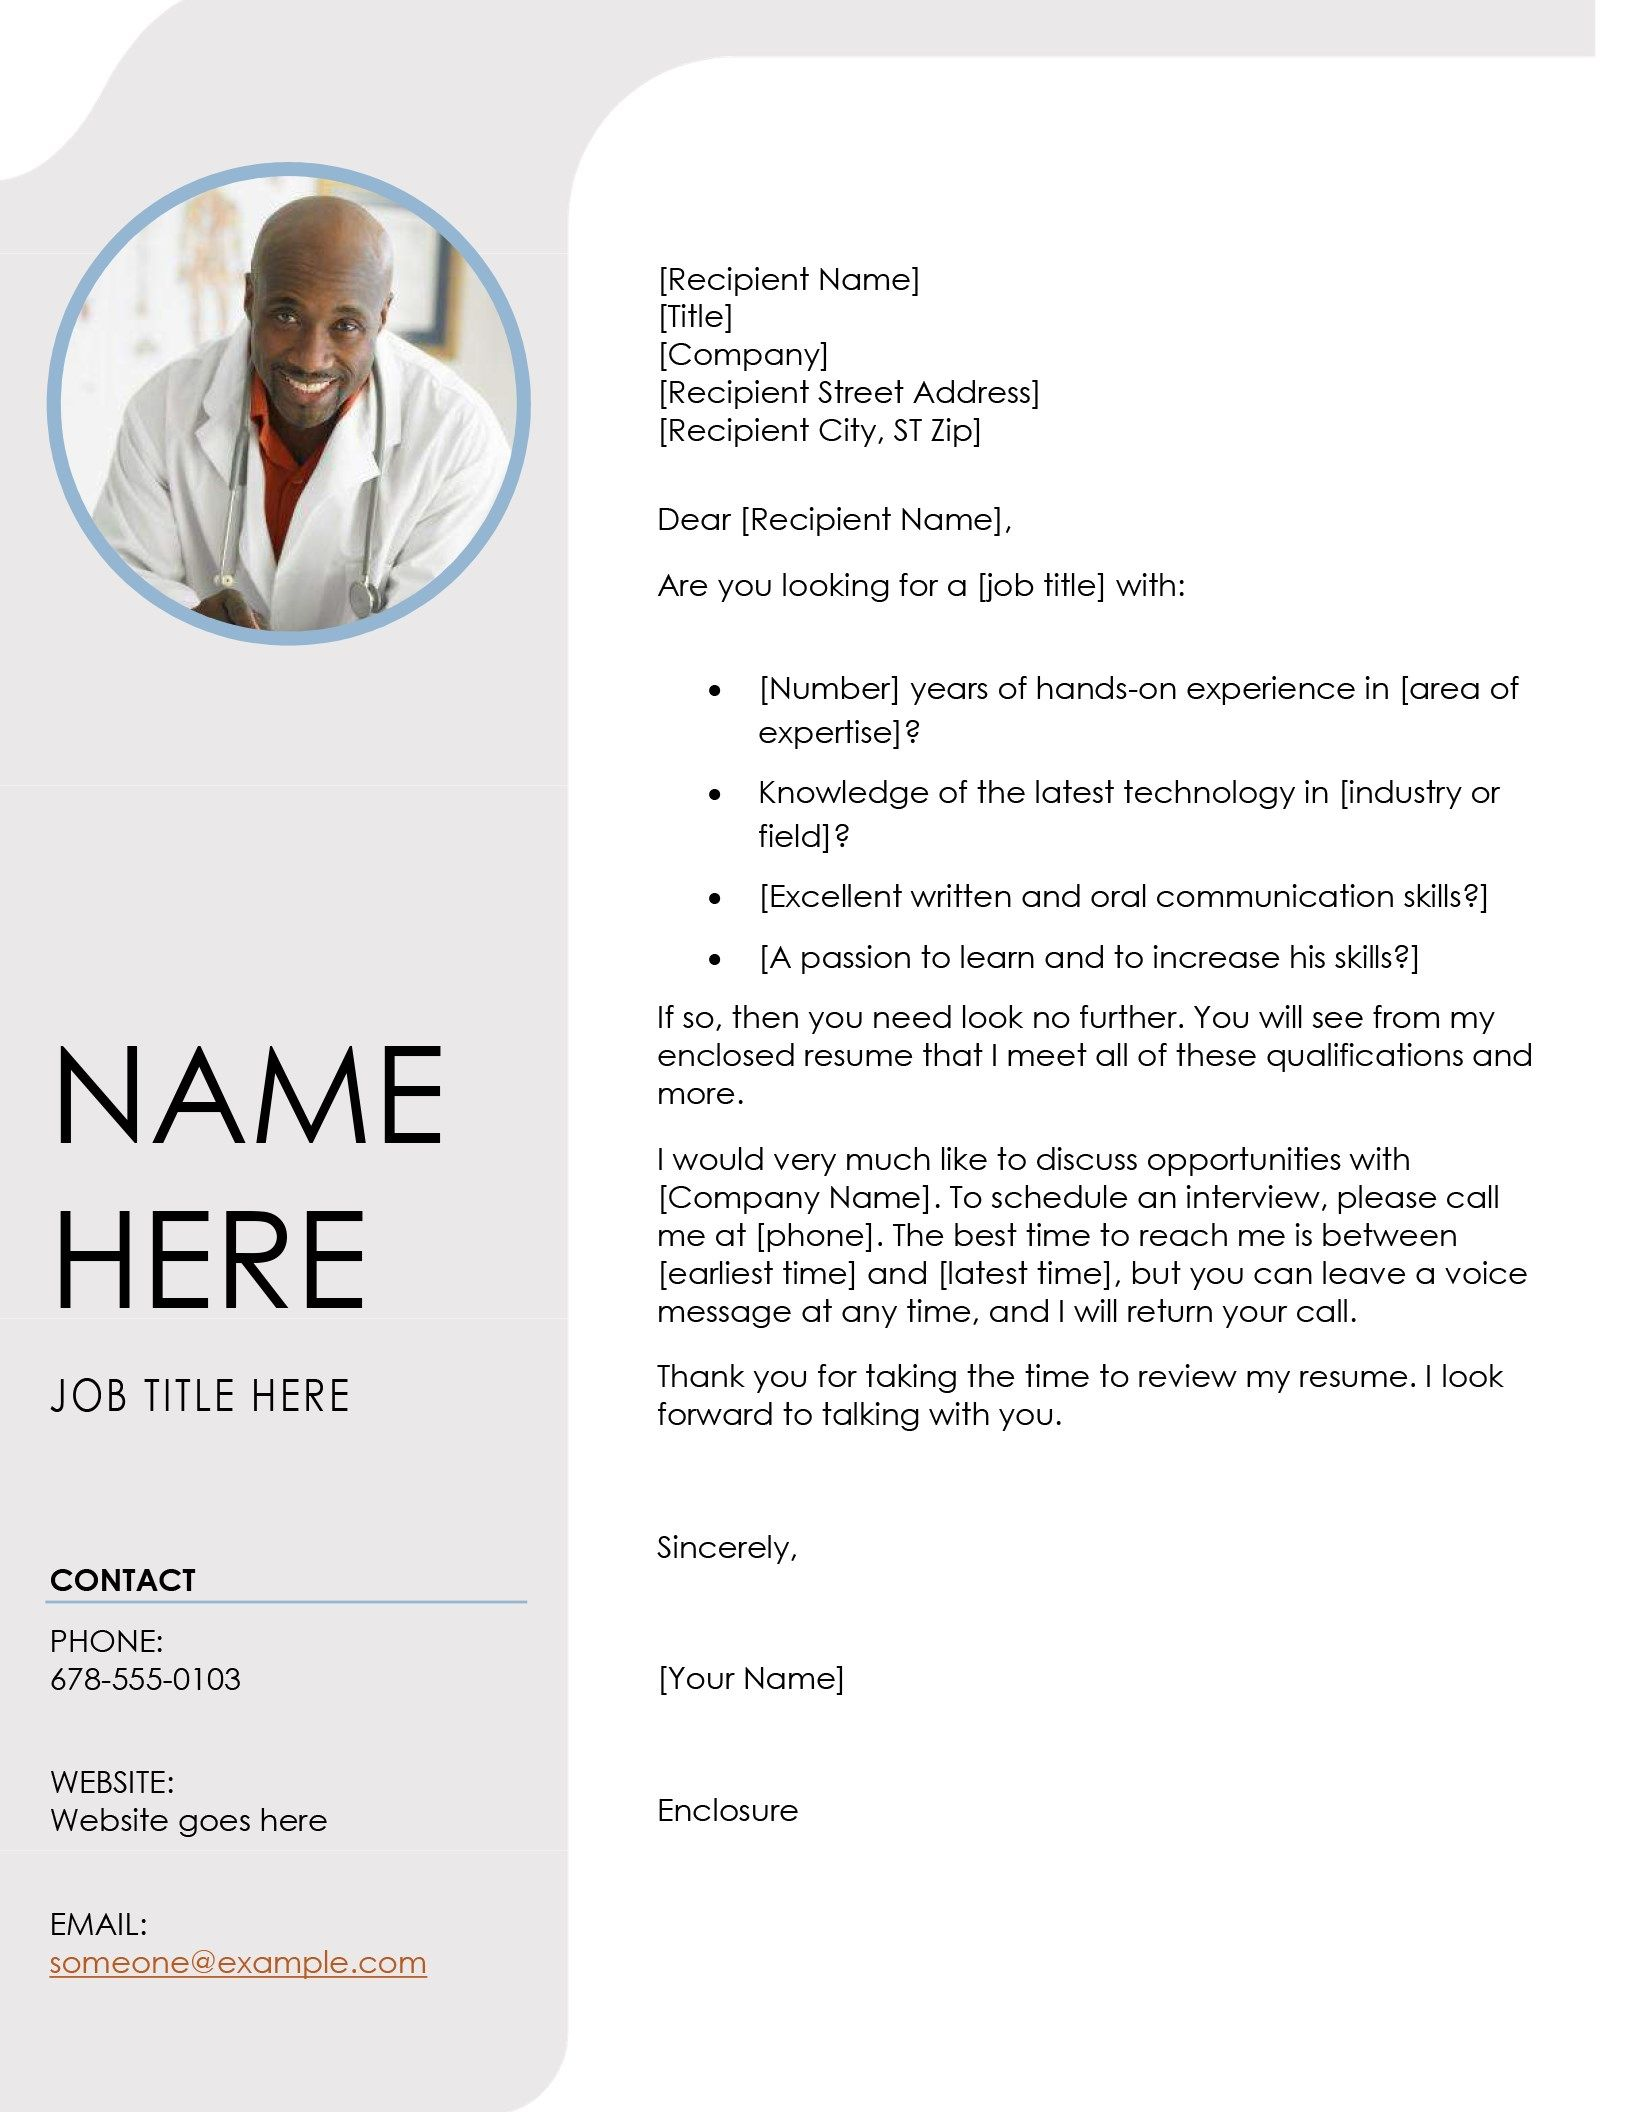 Blue grey cover letter Resume design template, Resume